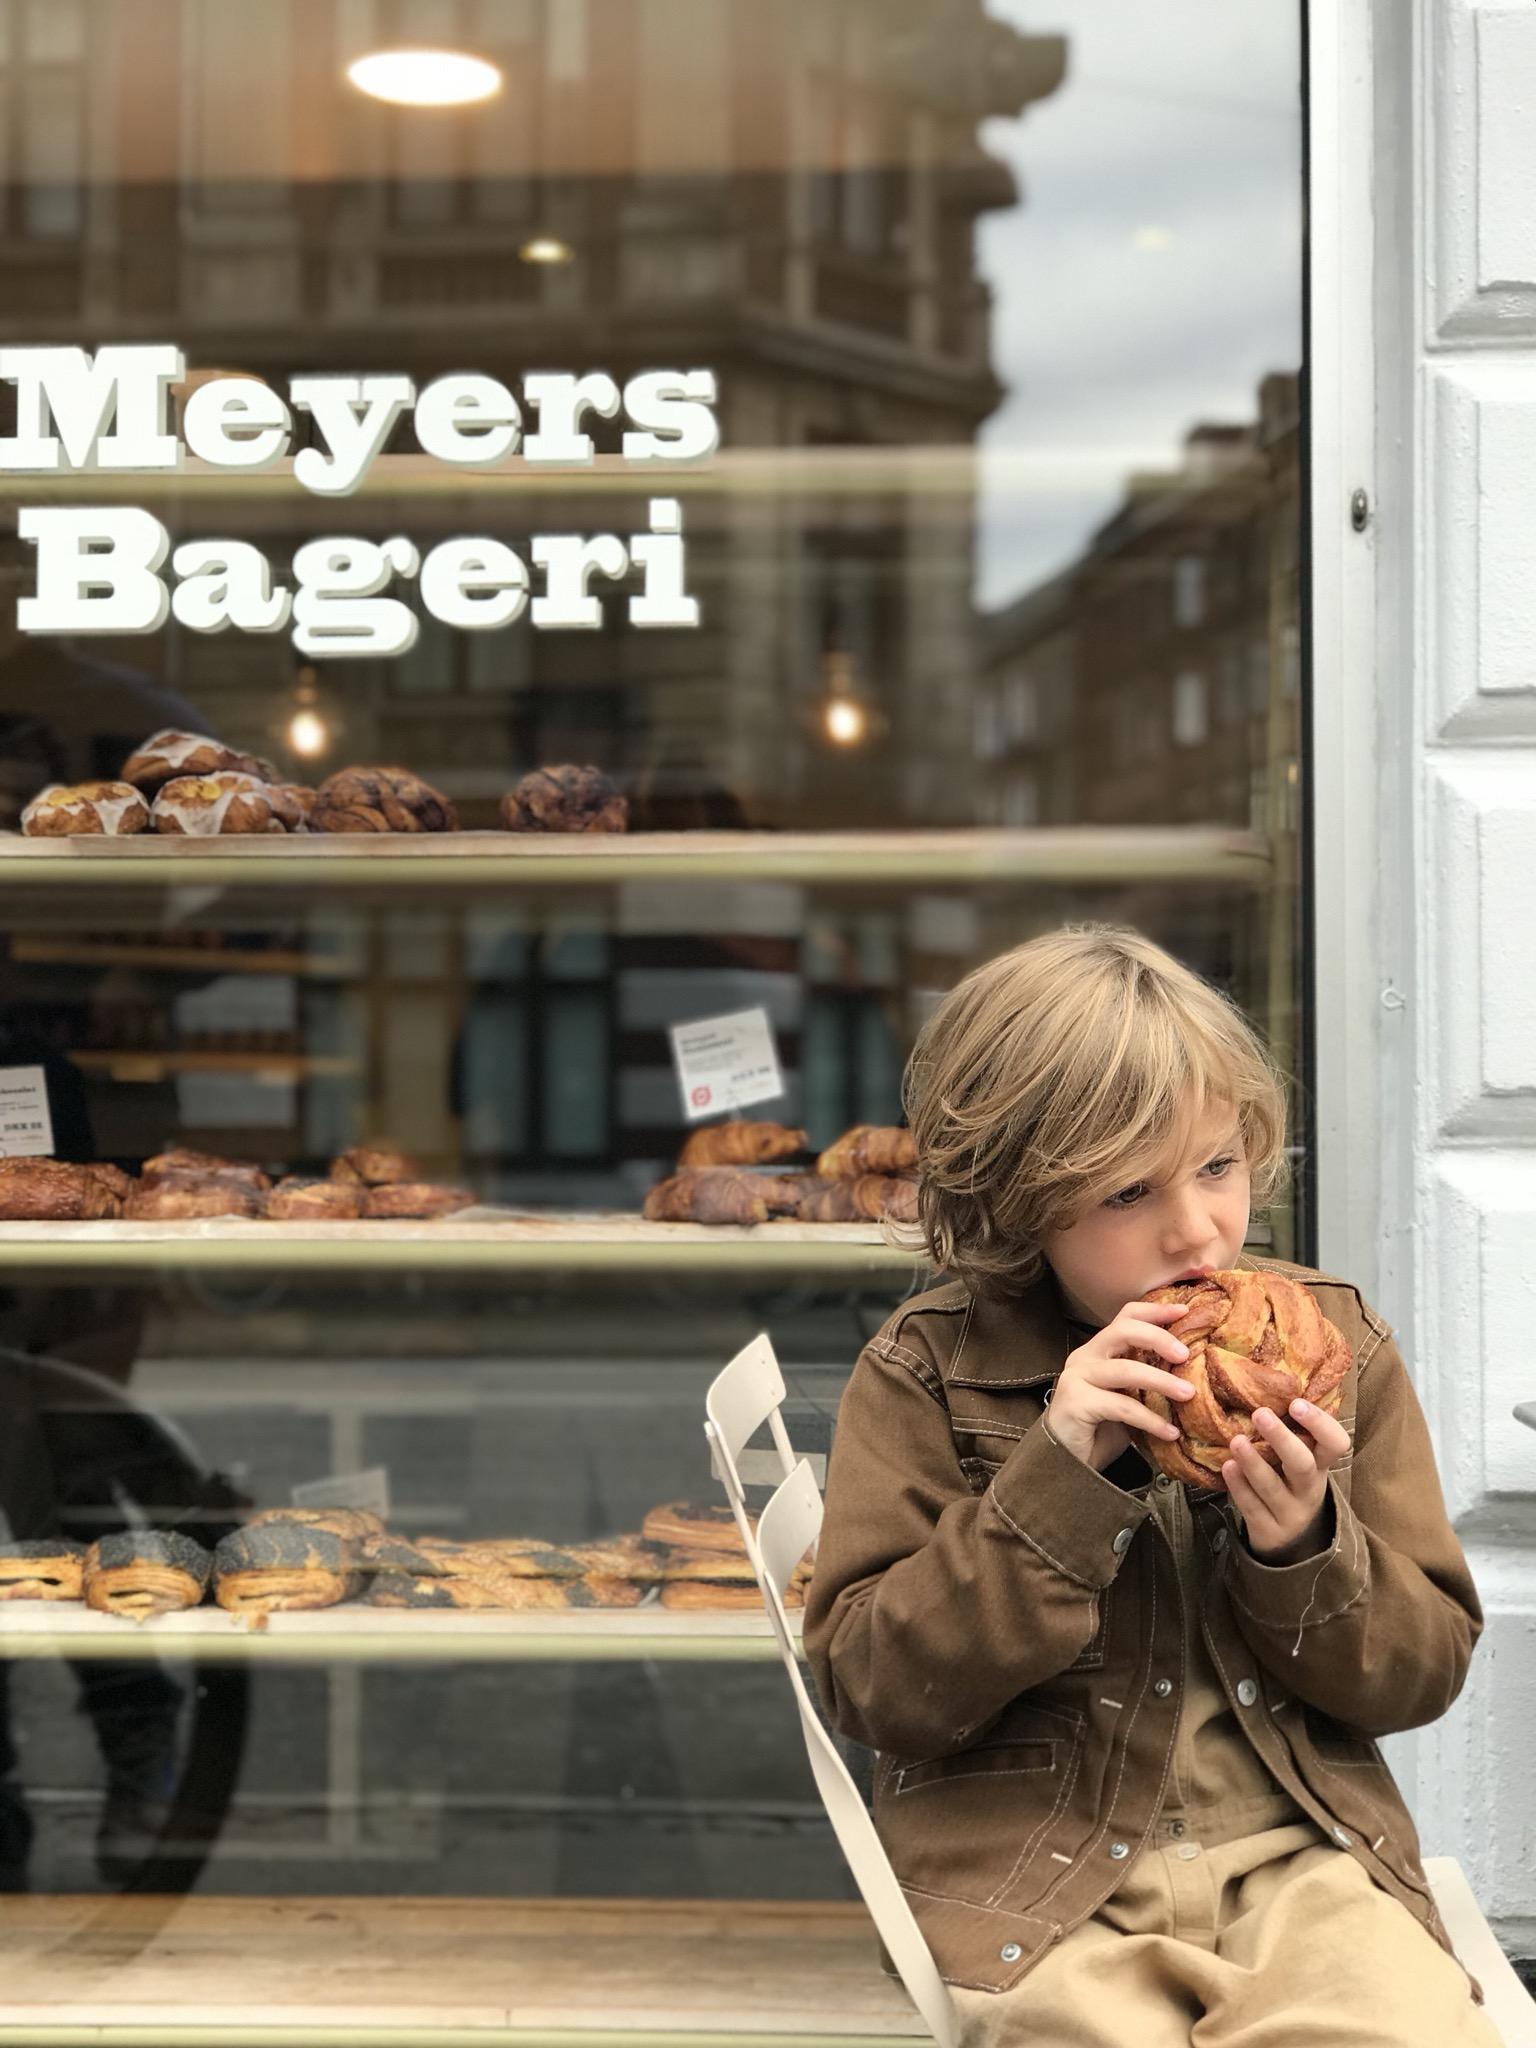 MeyersBageri_3.jpeg